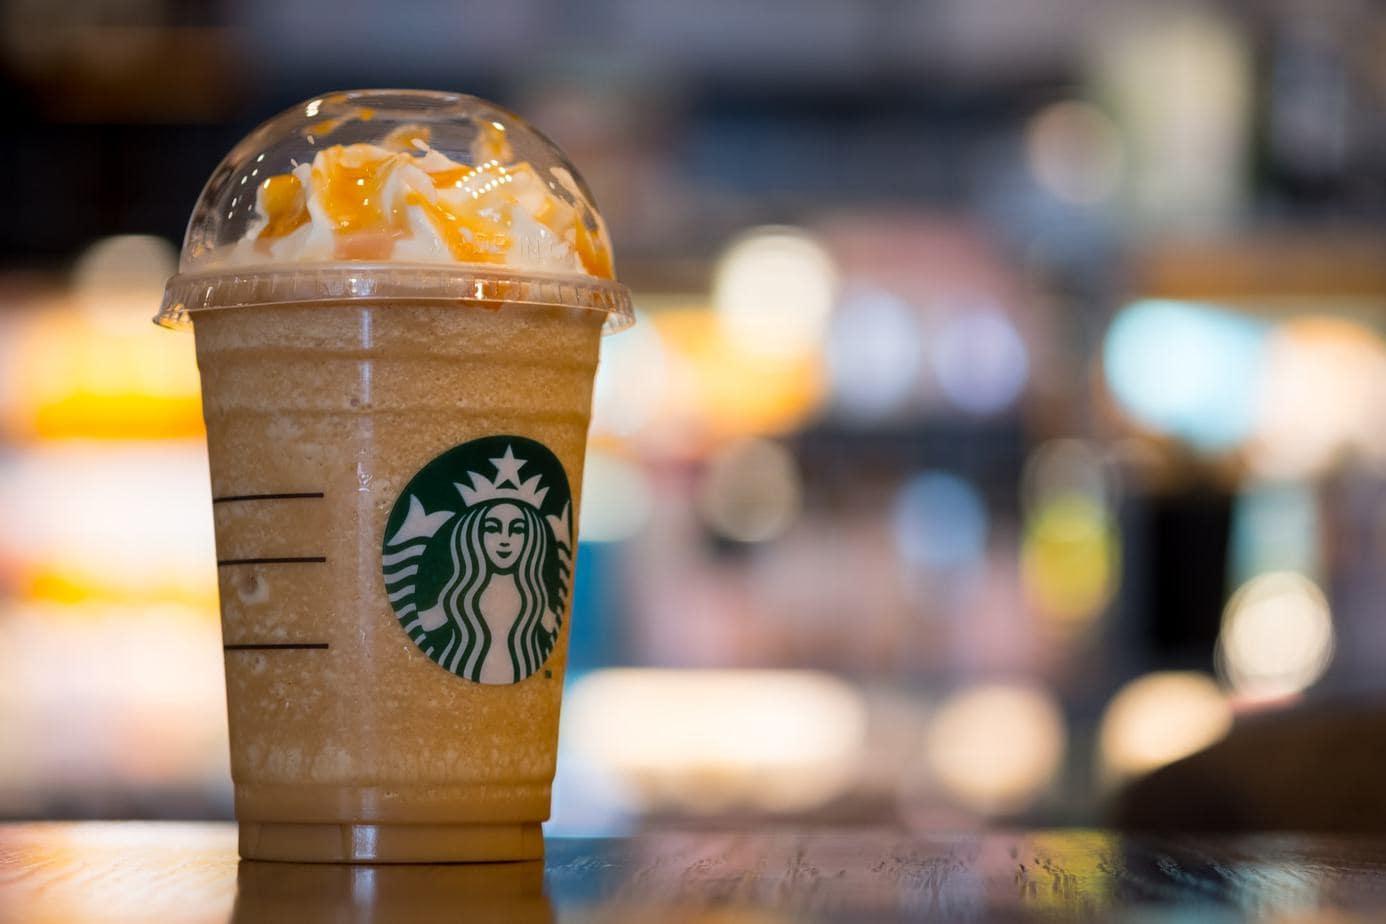 Starbucks Coffee Sauce